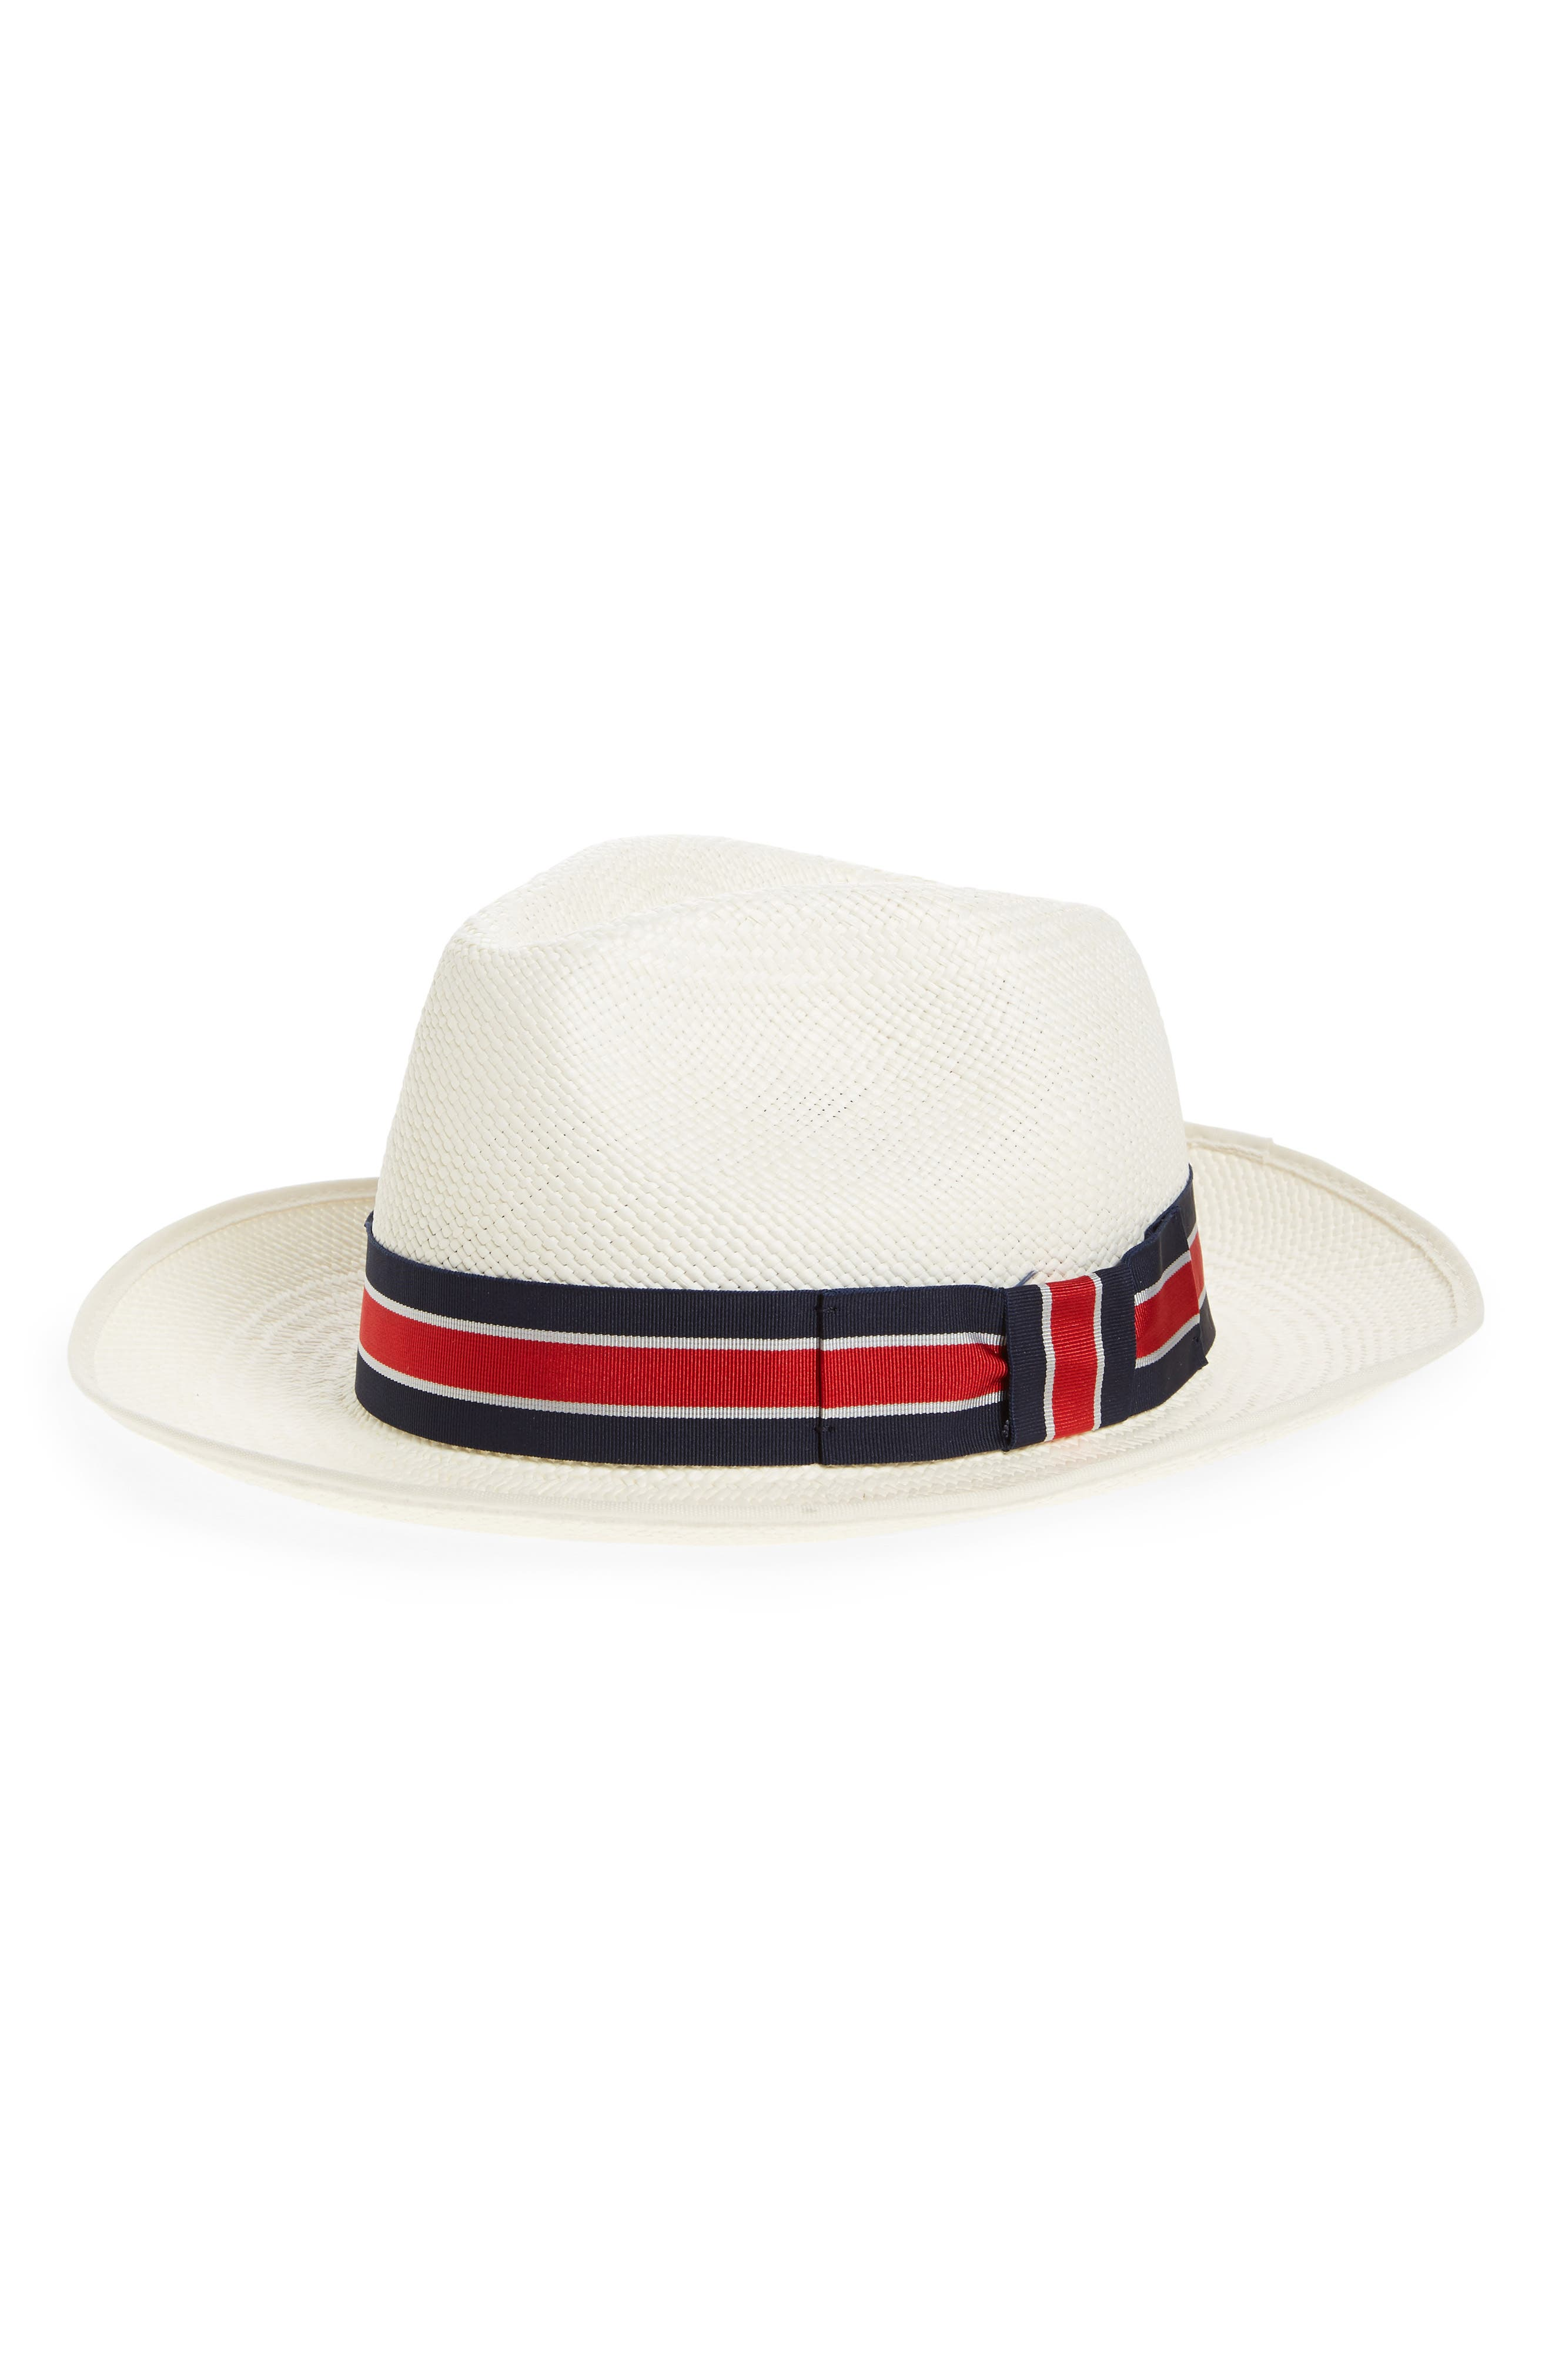 Christy's Preset Panama Hat,                             Main thumbnail 1, color,